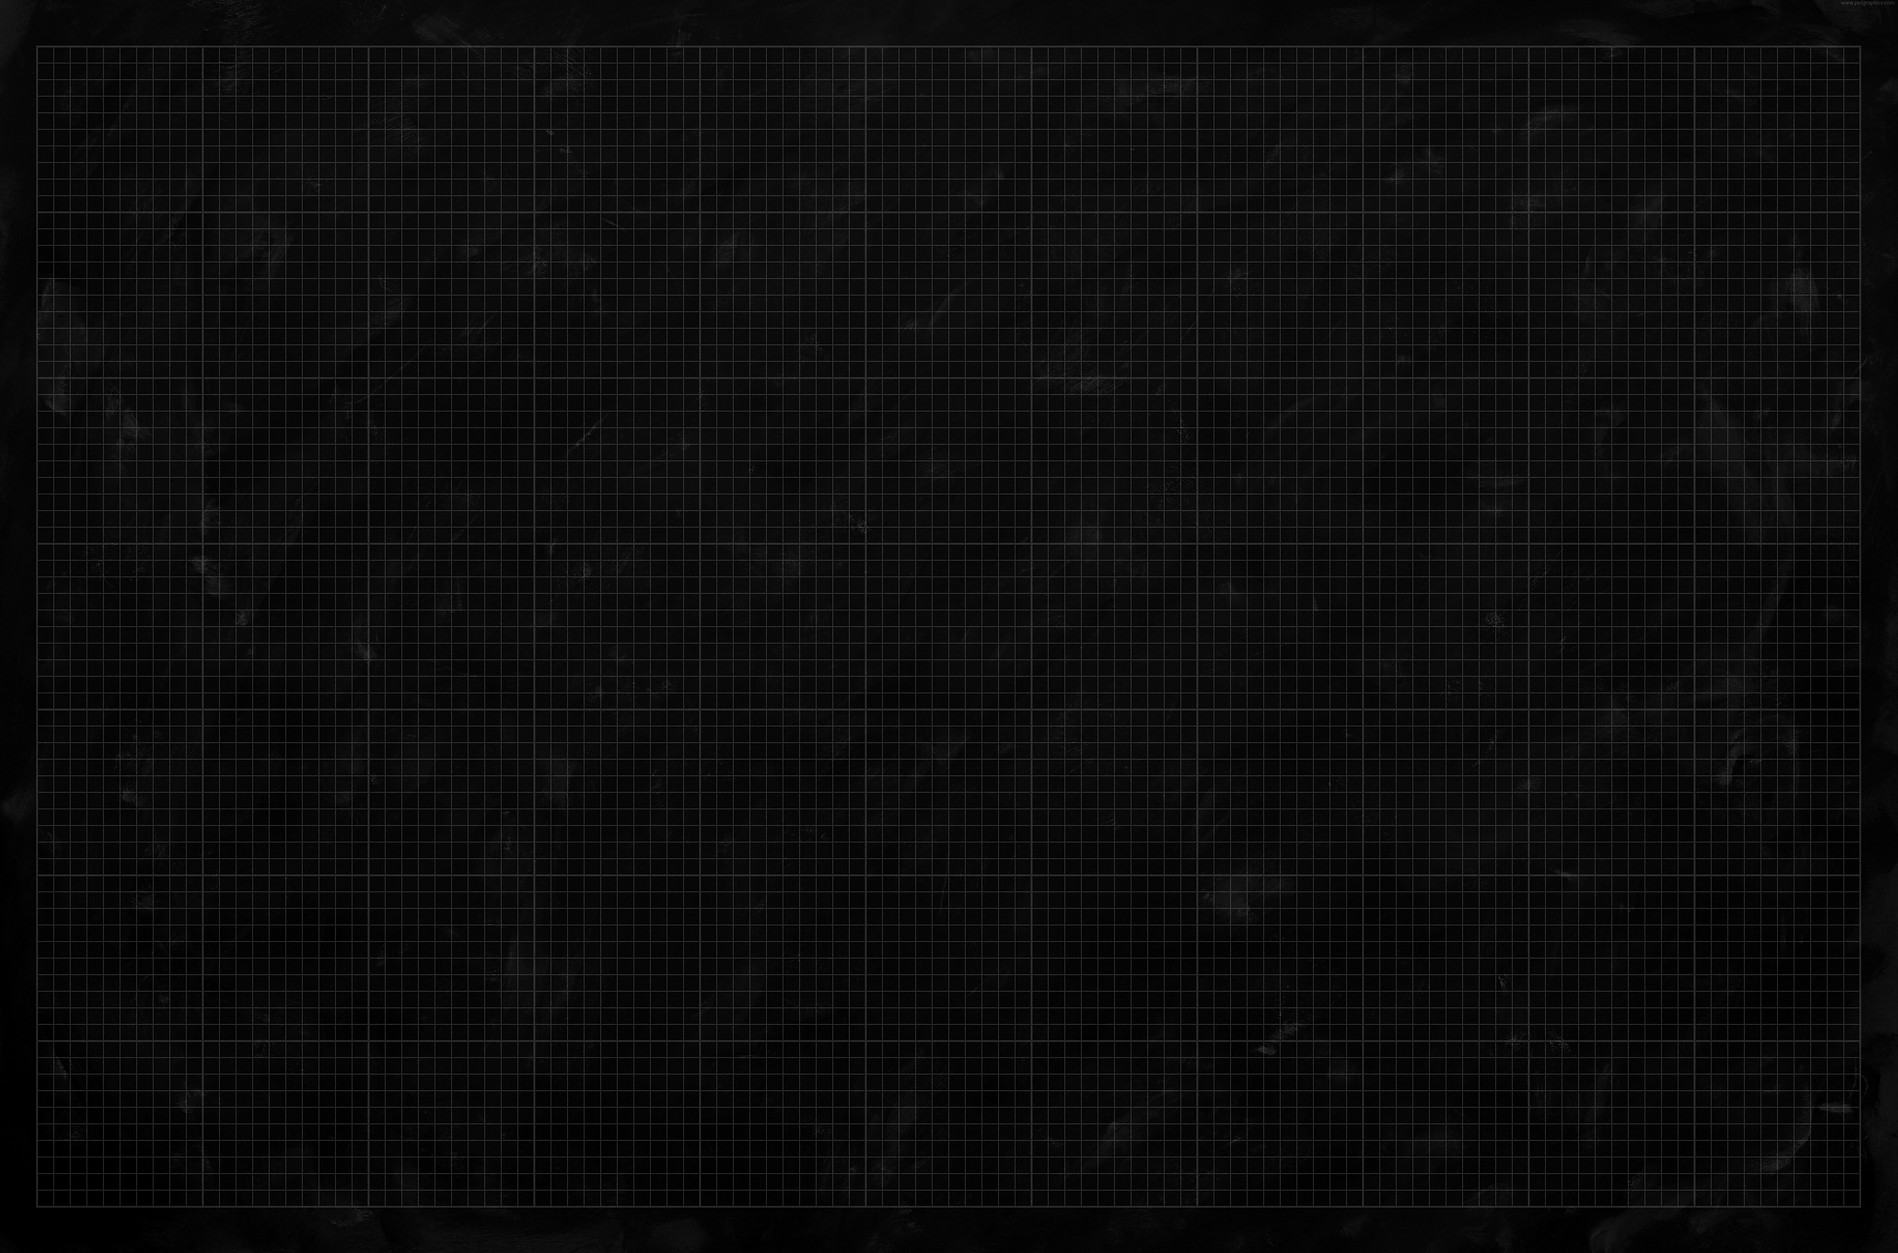 black-graph-paper-texture.jpg